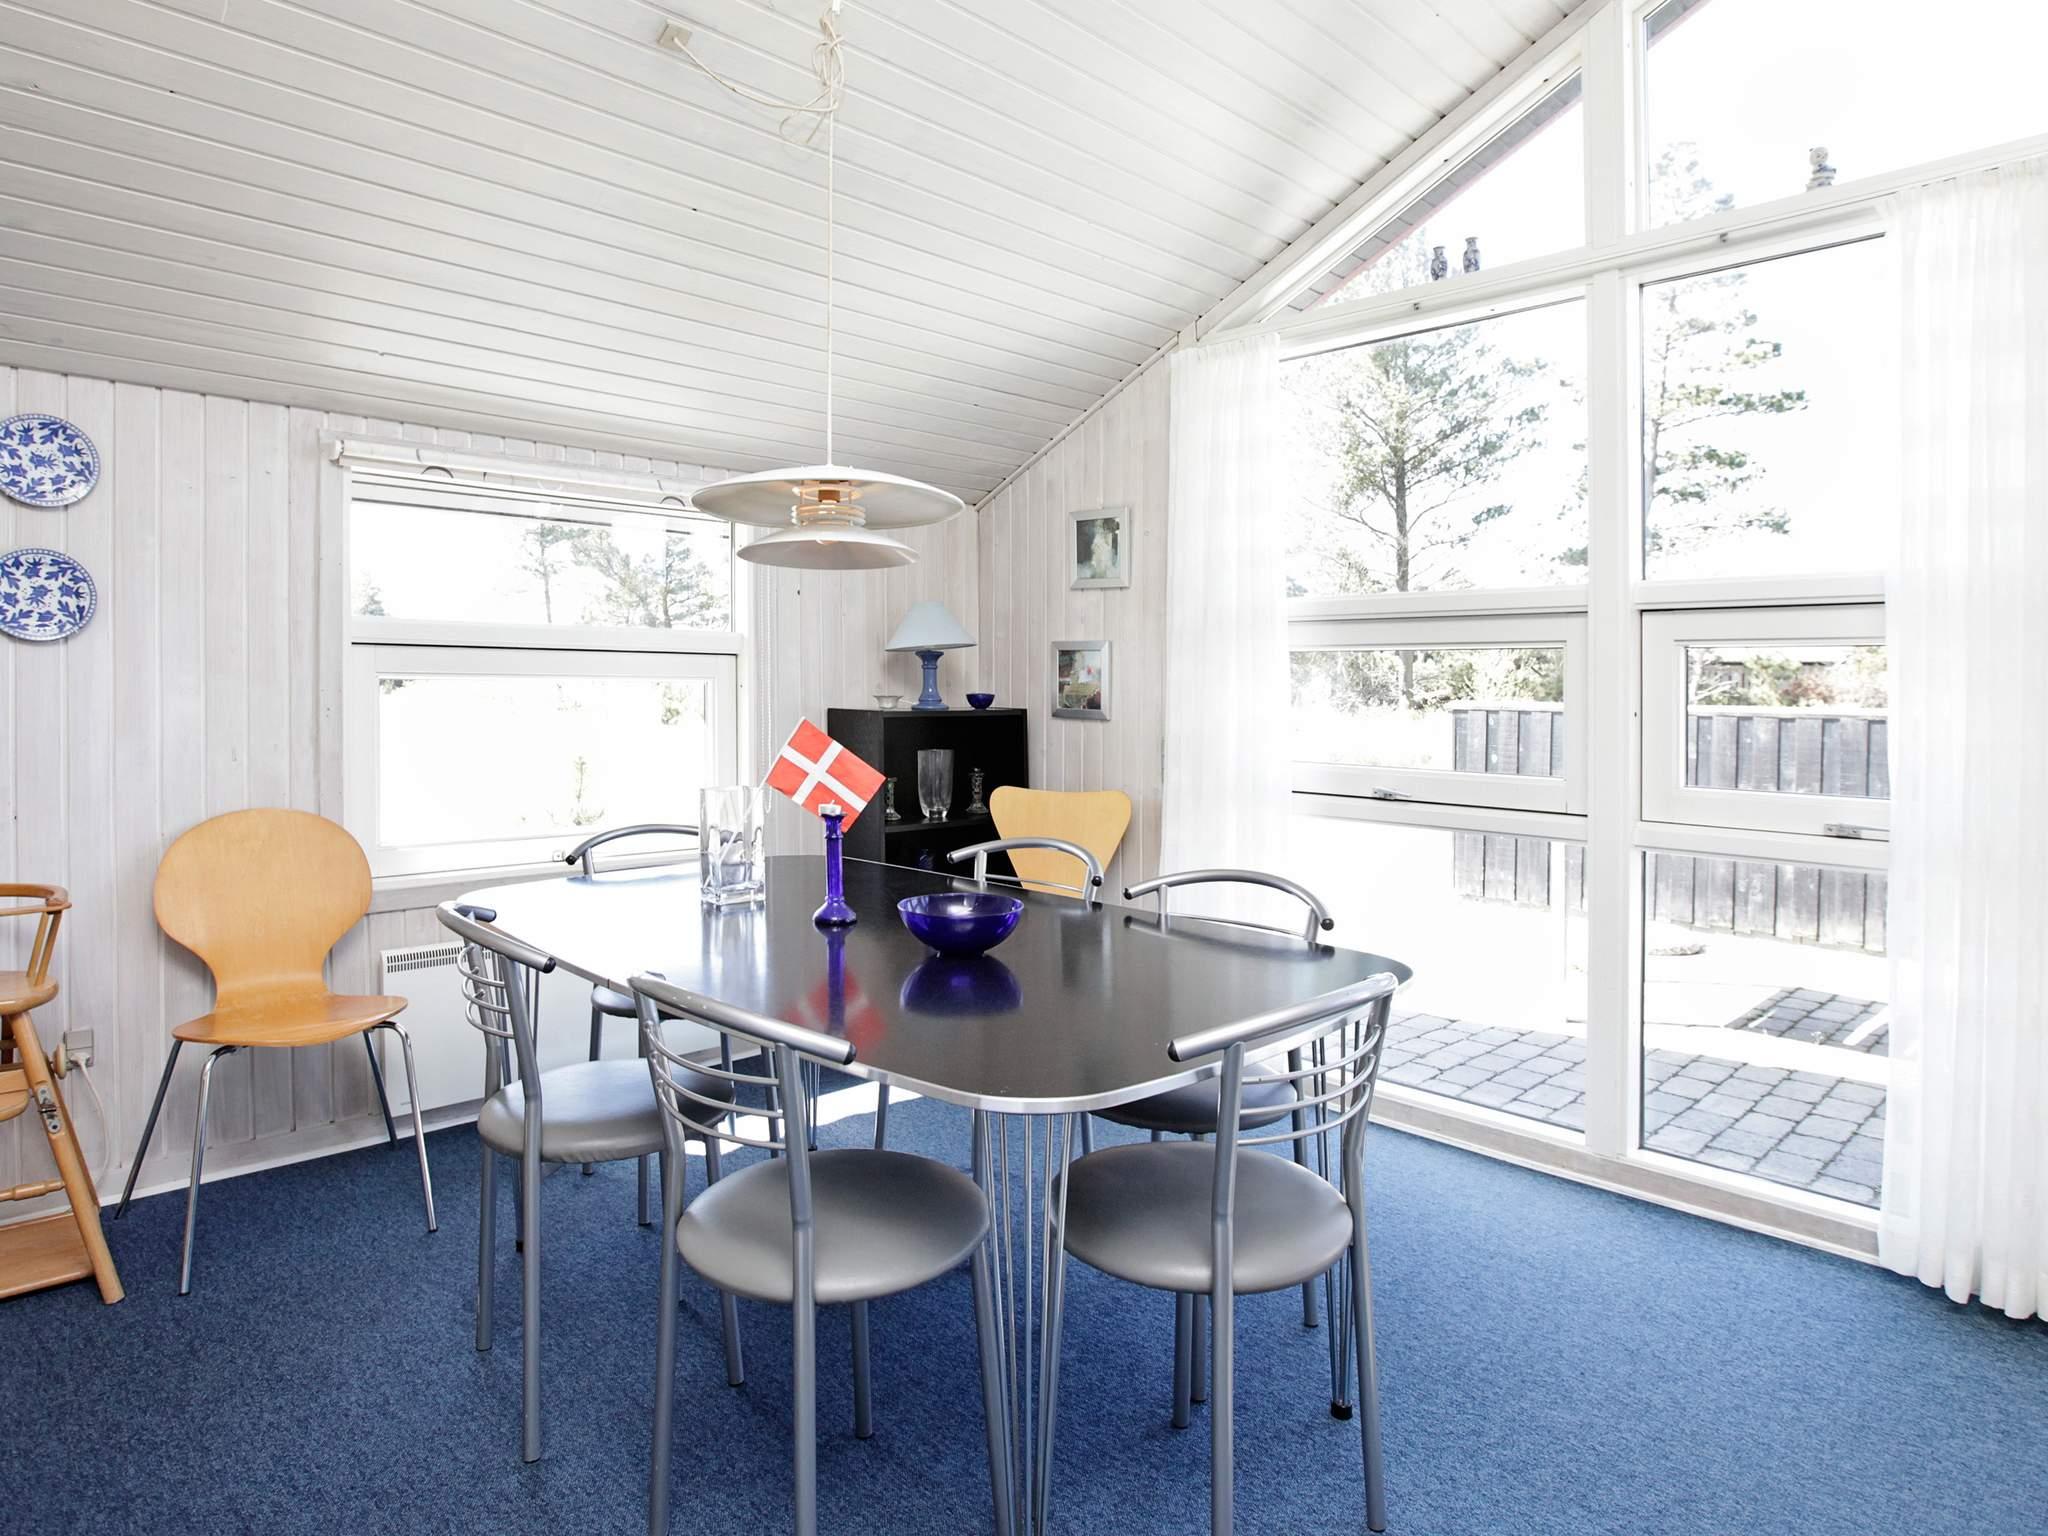 Ferienhaus Blåvand (88586), Blåvand, , Westjütland, Dänemark, Bild 5